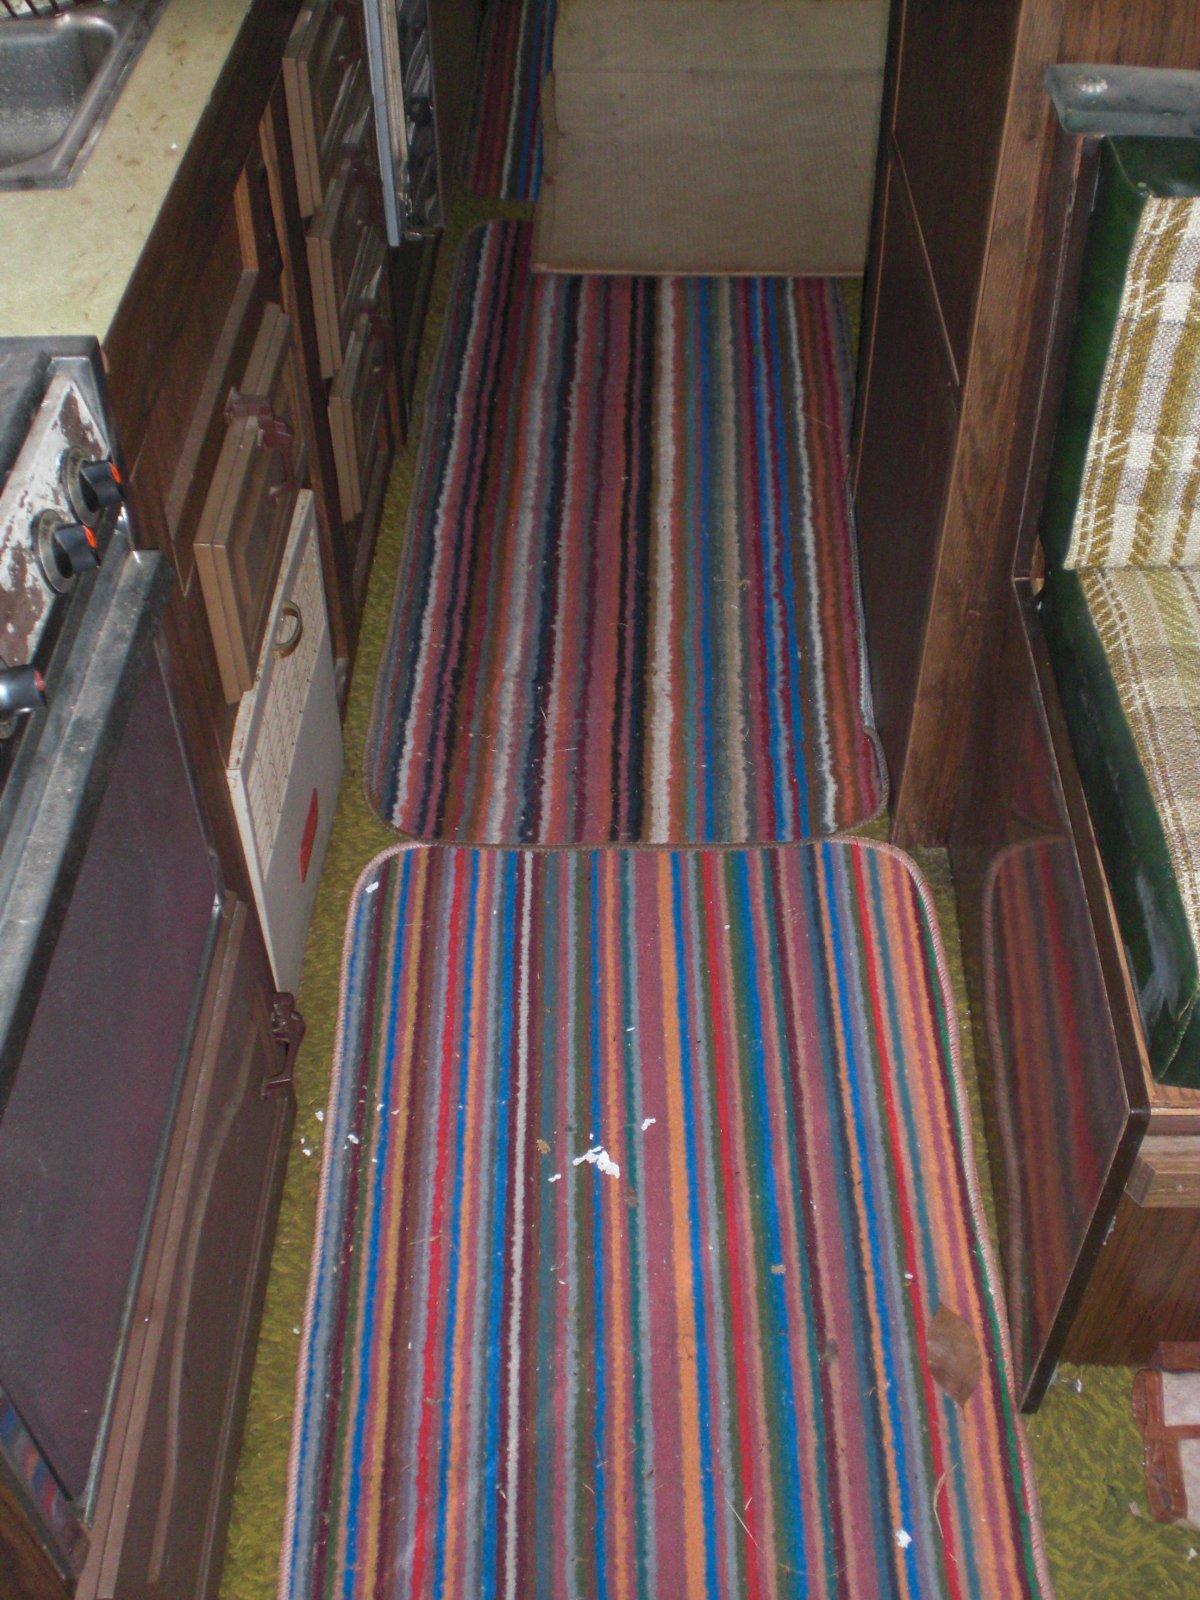 Click image for larger version  Name:carpet on carpet.jpg Views:61 Size:340.0 KB ID:9772